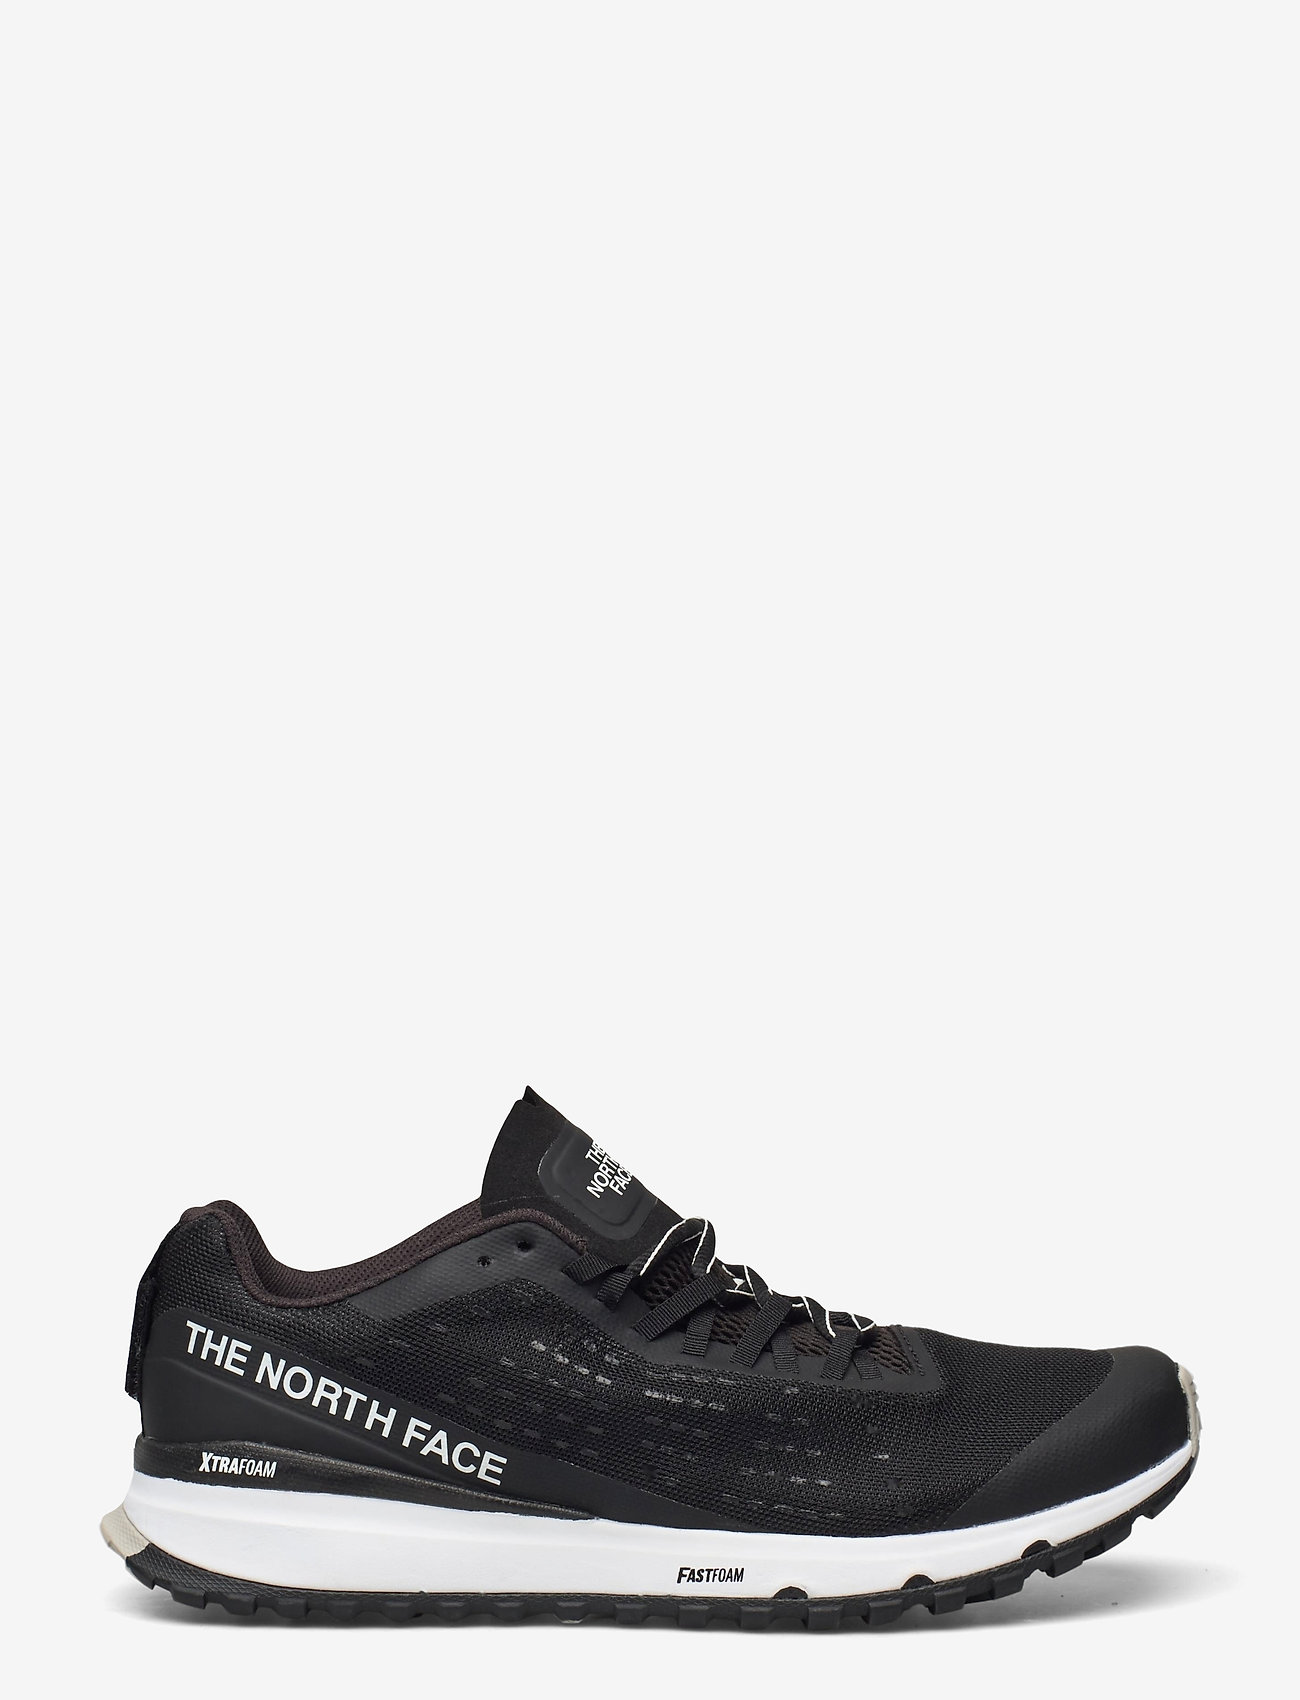 The North Face - M ULTRA SWIFT - chaussures de randonnée - tnf black/tnf white - 1